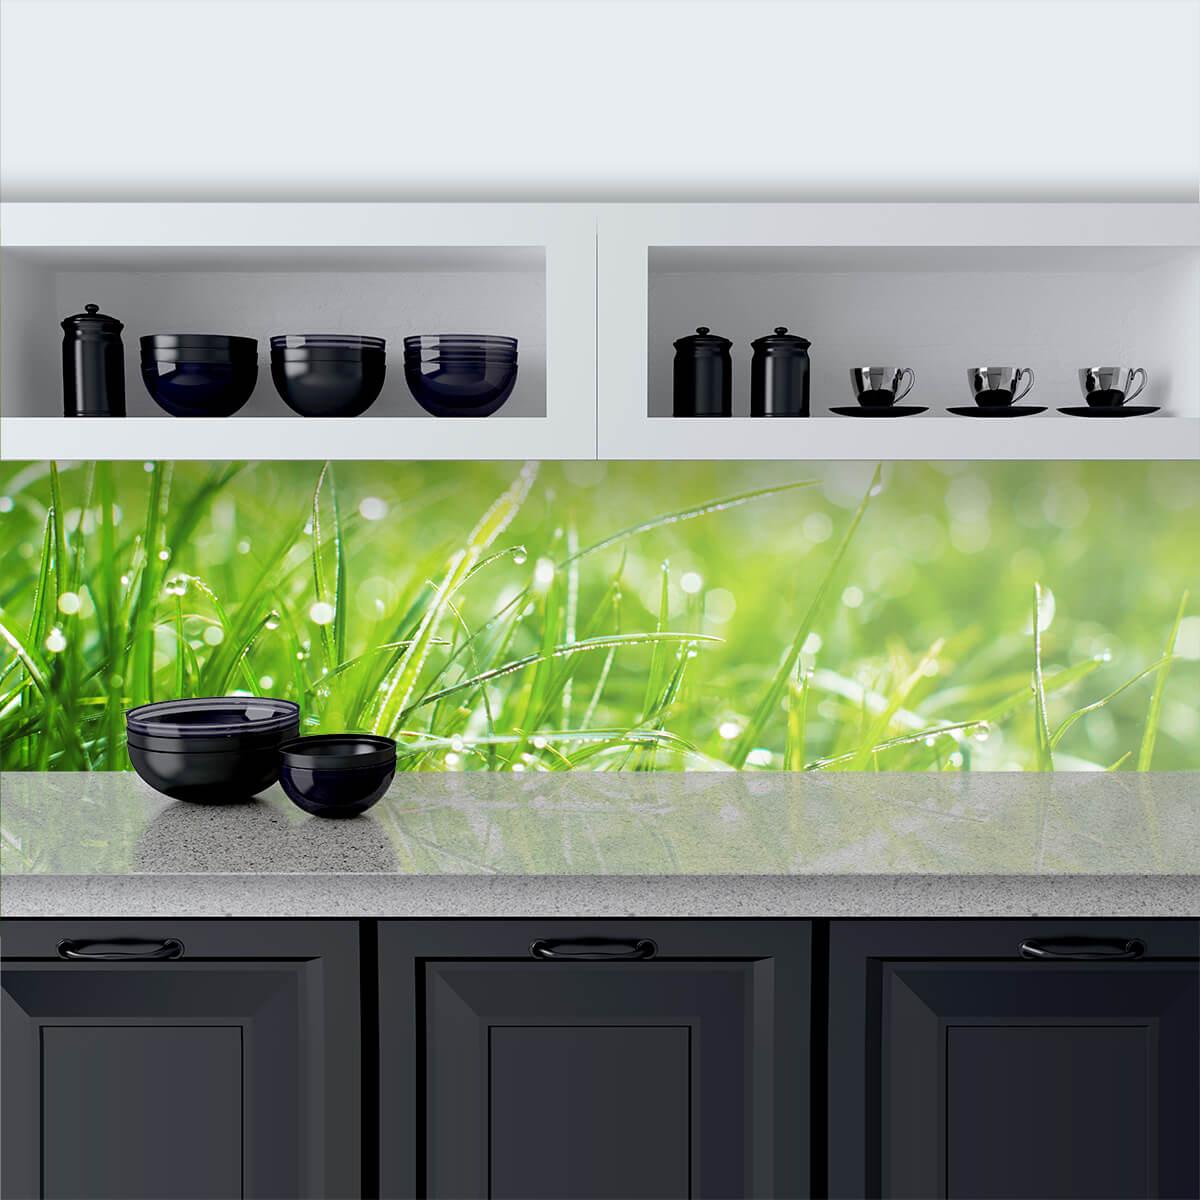 Full Size of Glaswand Küche Montage Glaswand Küche Preis Glaswand Küche Wohnzimmer Glaswand Küche Beleuchtet Küche Glaswand Küche